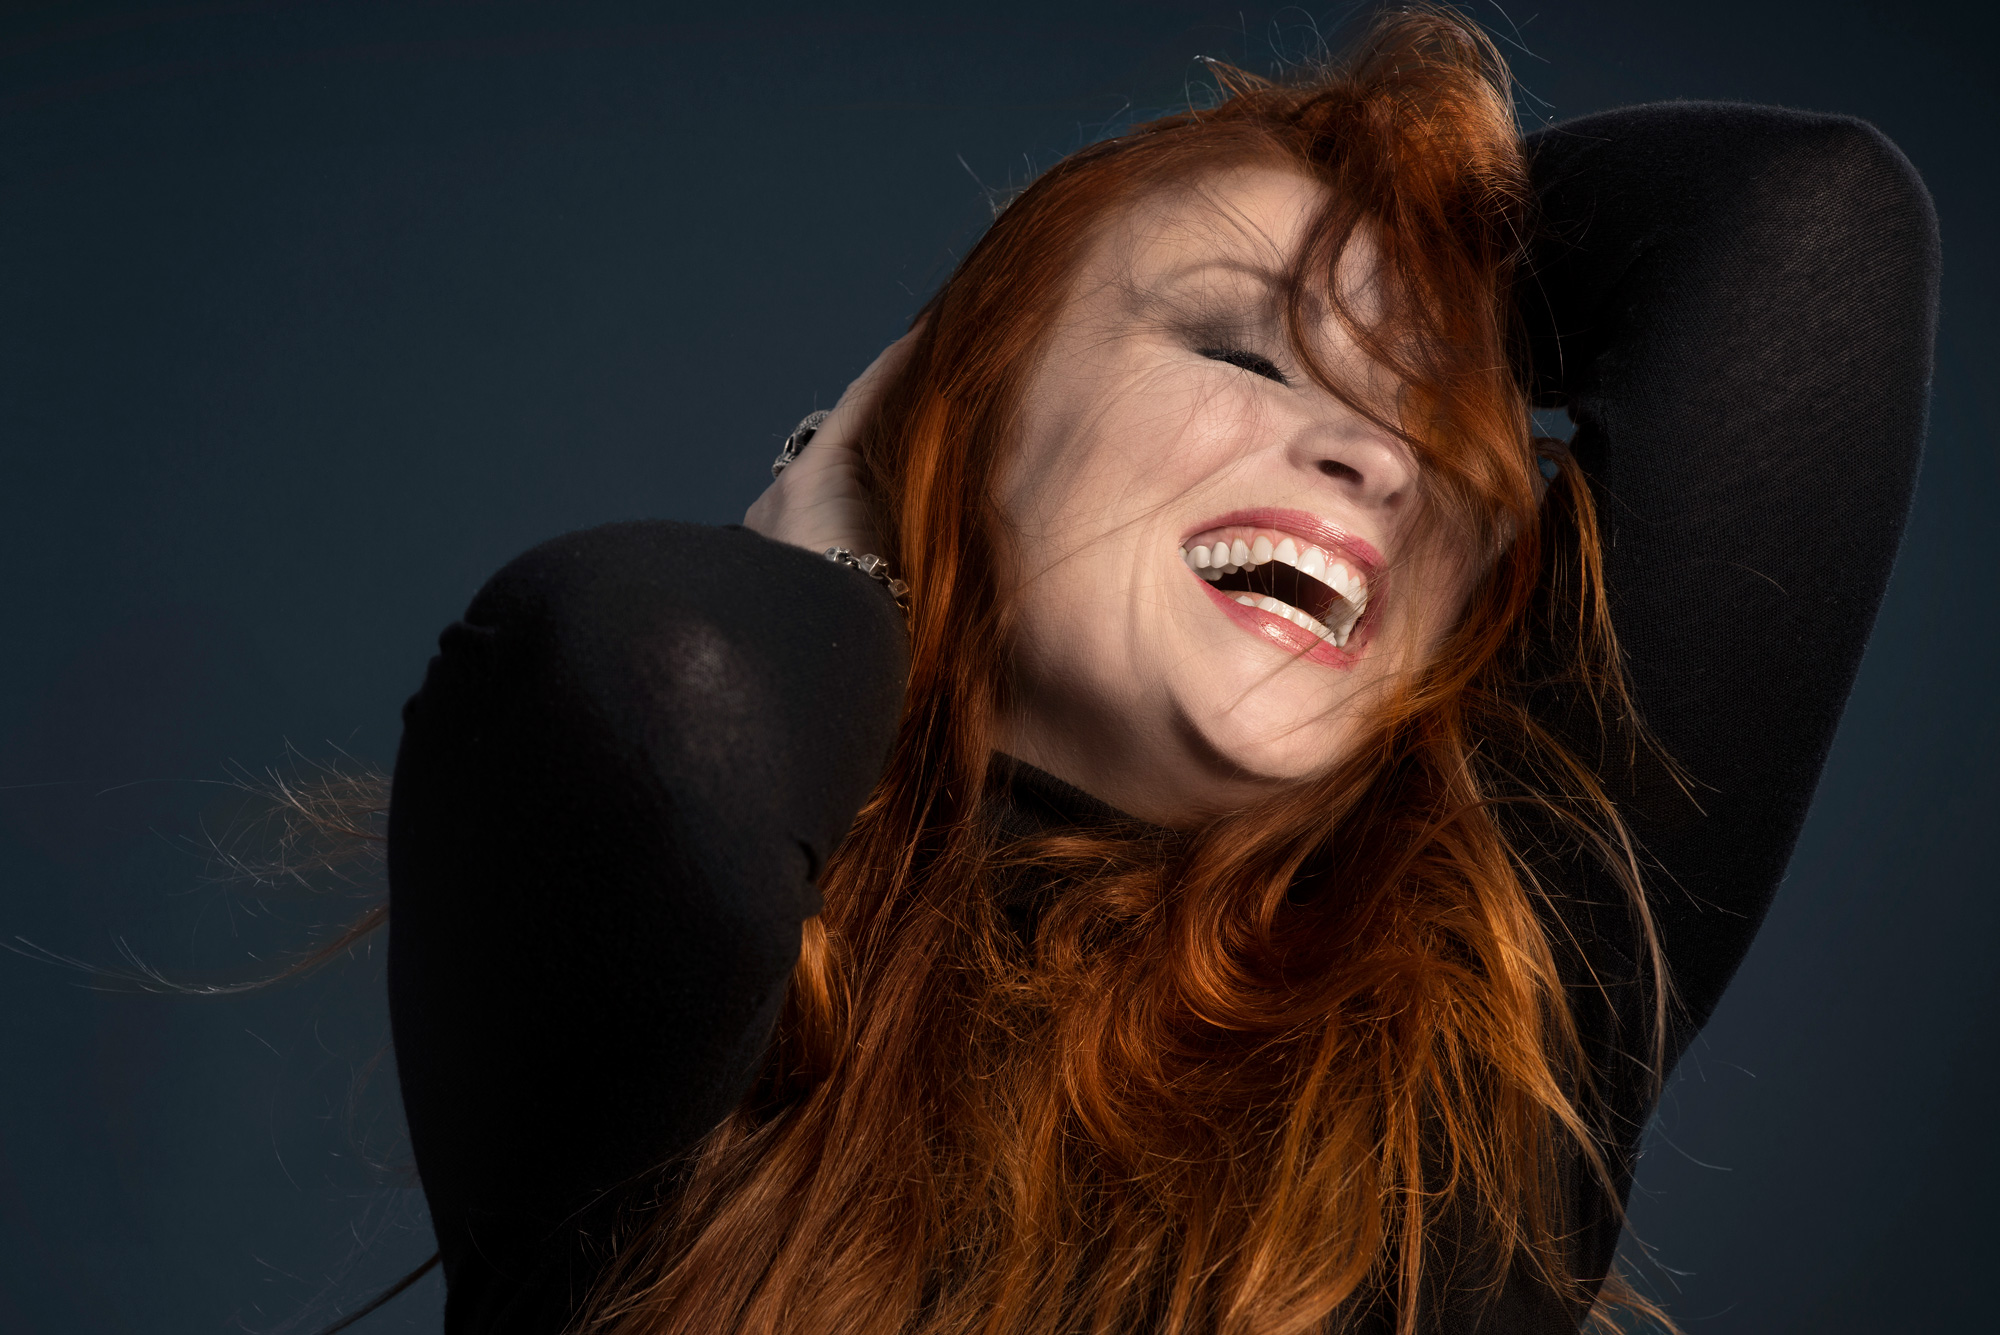 Jazz_Judith Owen-Mahogany Hall Bern_szenik